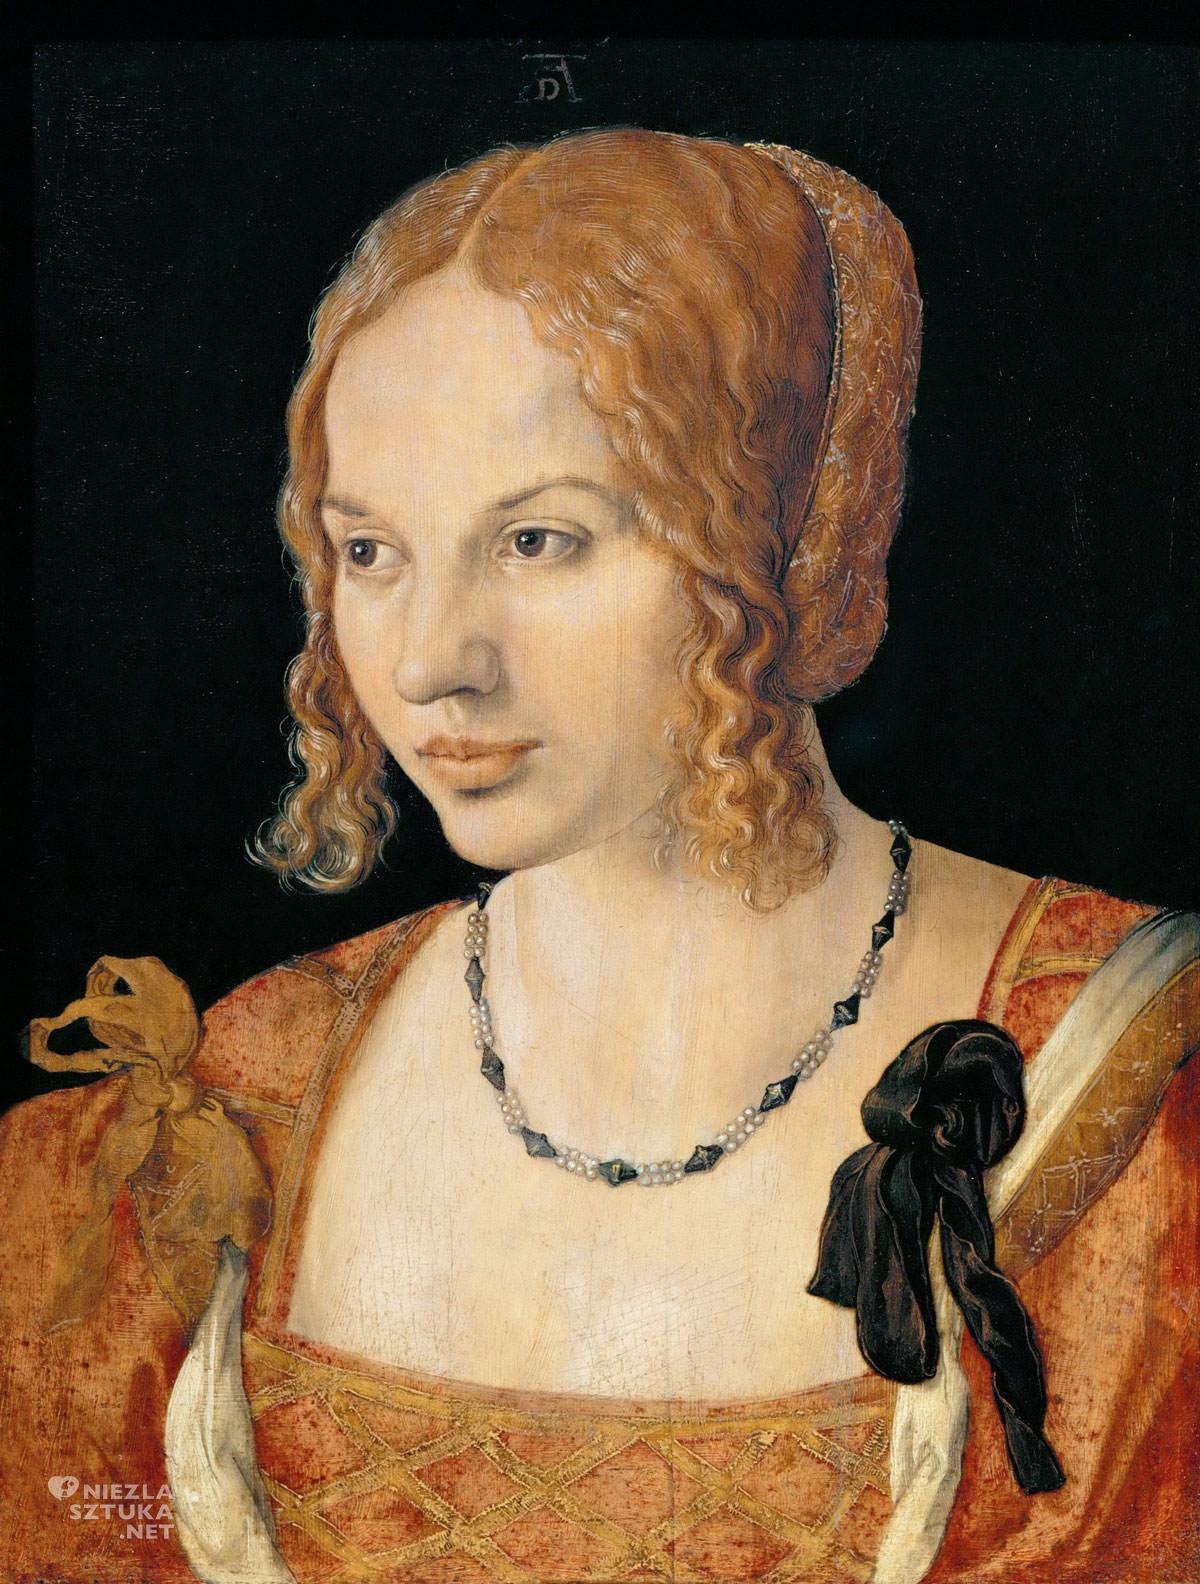 Albrecht Dürer, Kunsthistorisches Museum, portret, Wiedeń, Wenecja, Wenecjanka, Niezła sztuka